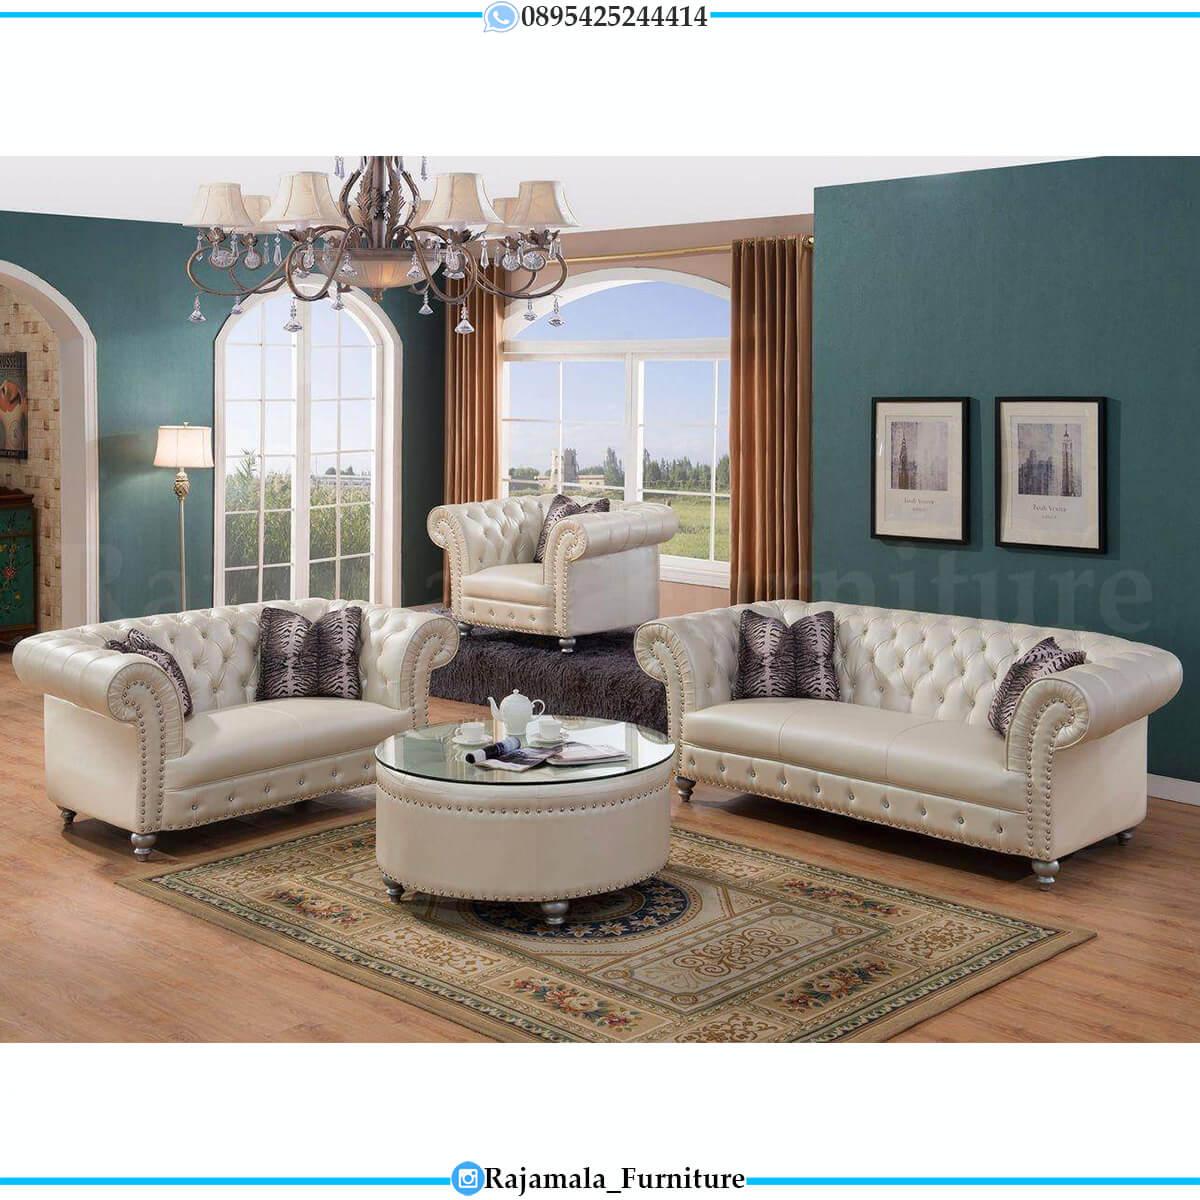 Sofa Tamu Mewah Minimalis Luxury Furniture Jepara Asli RM-0605